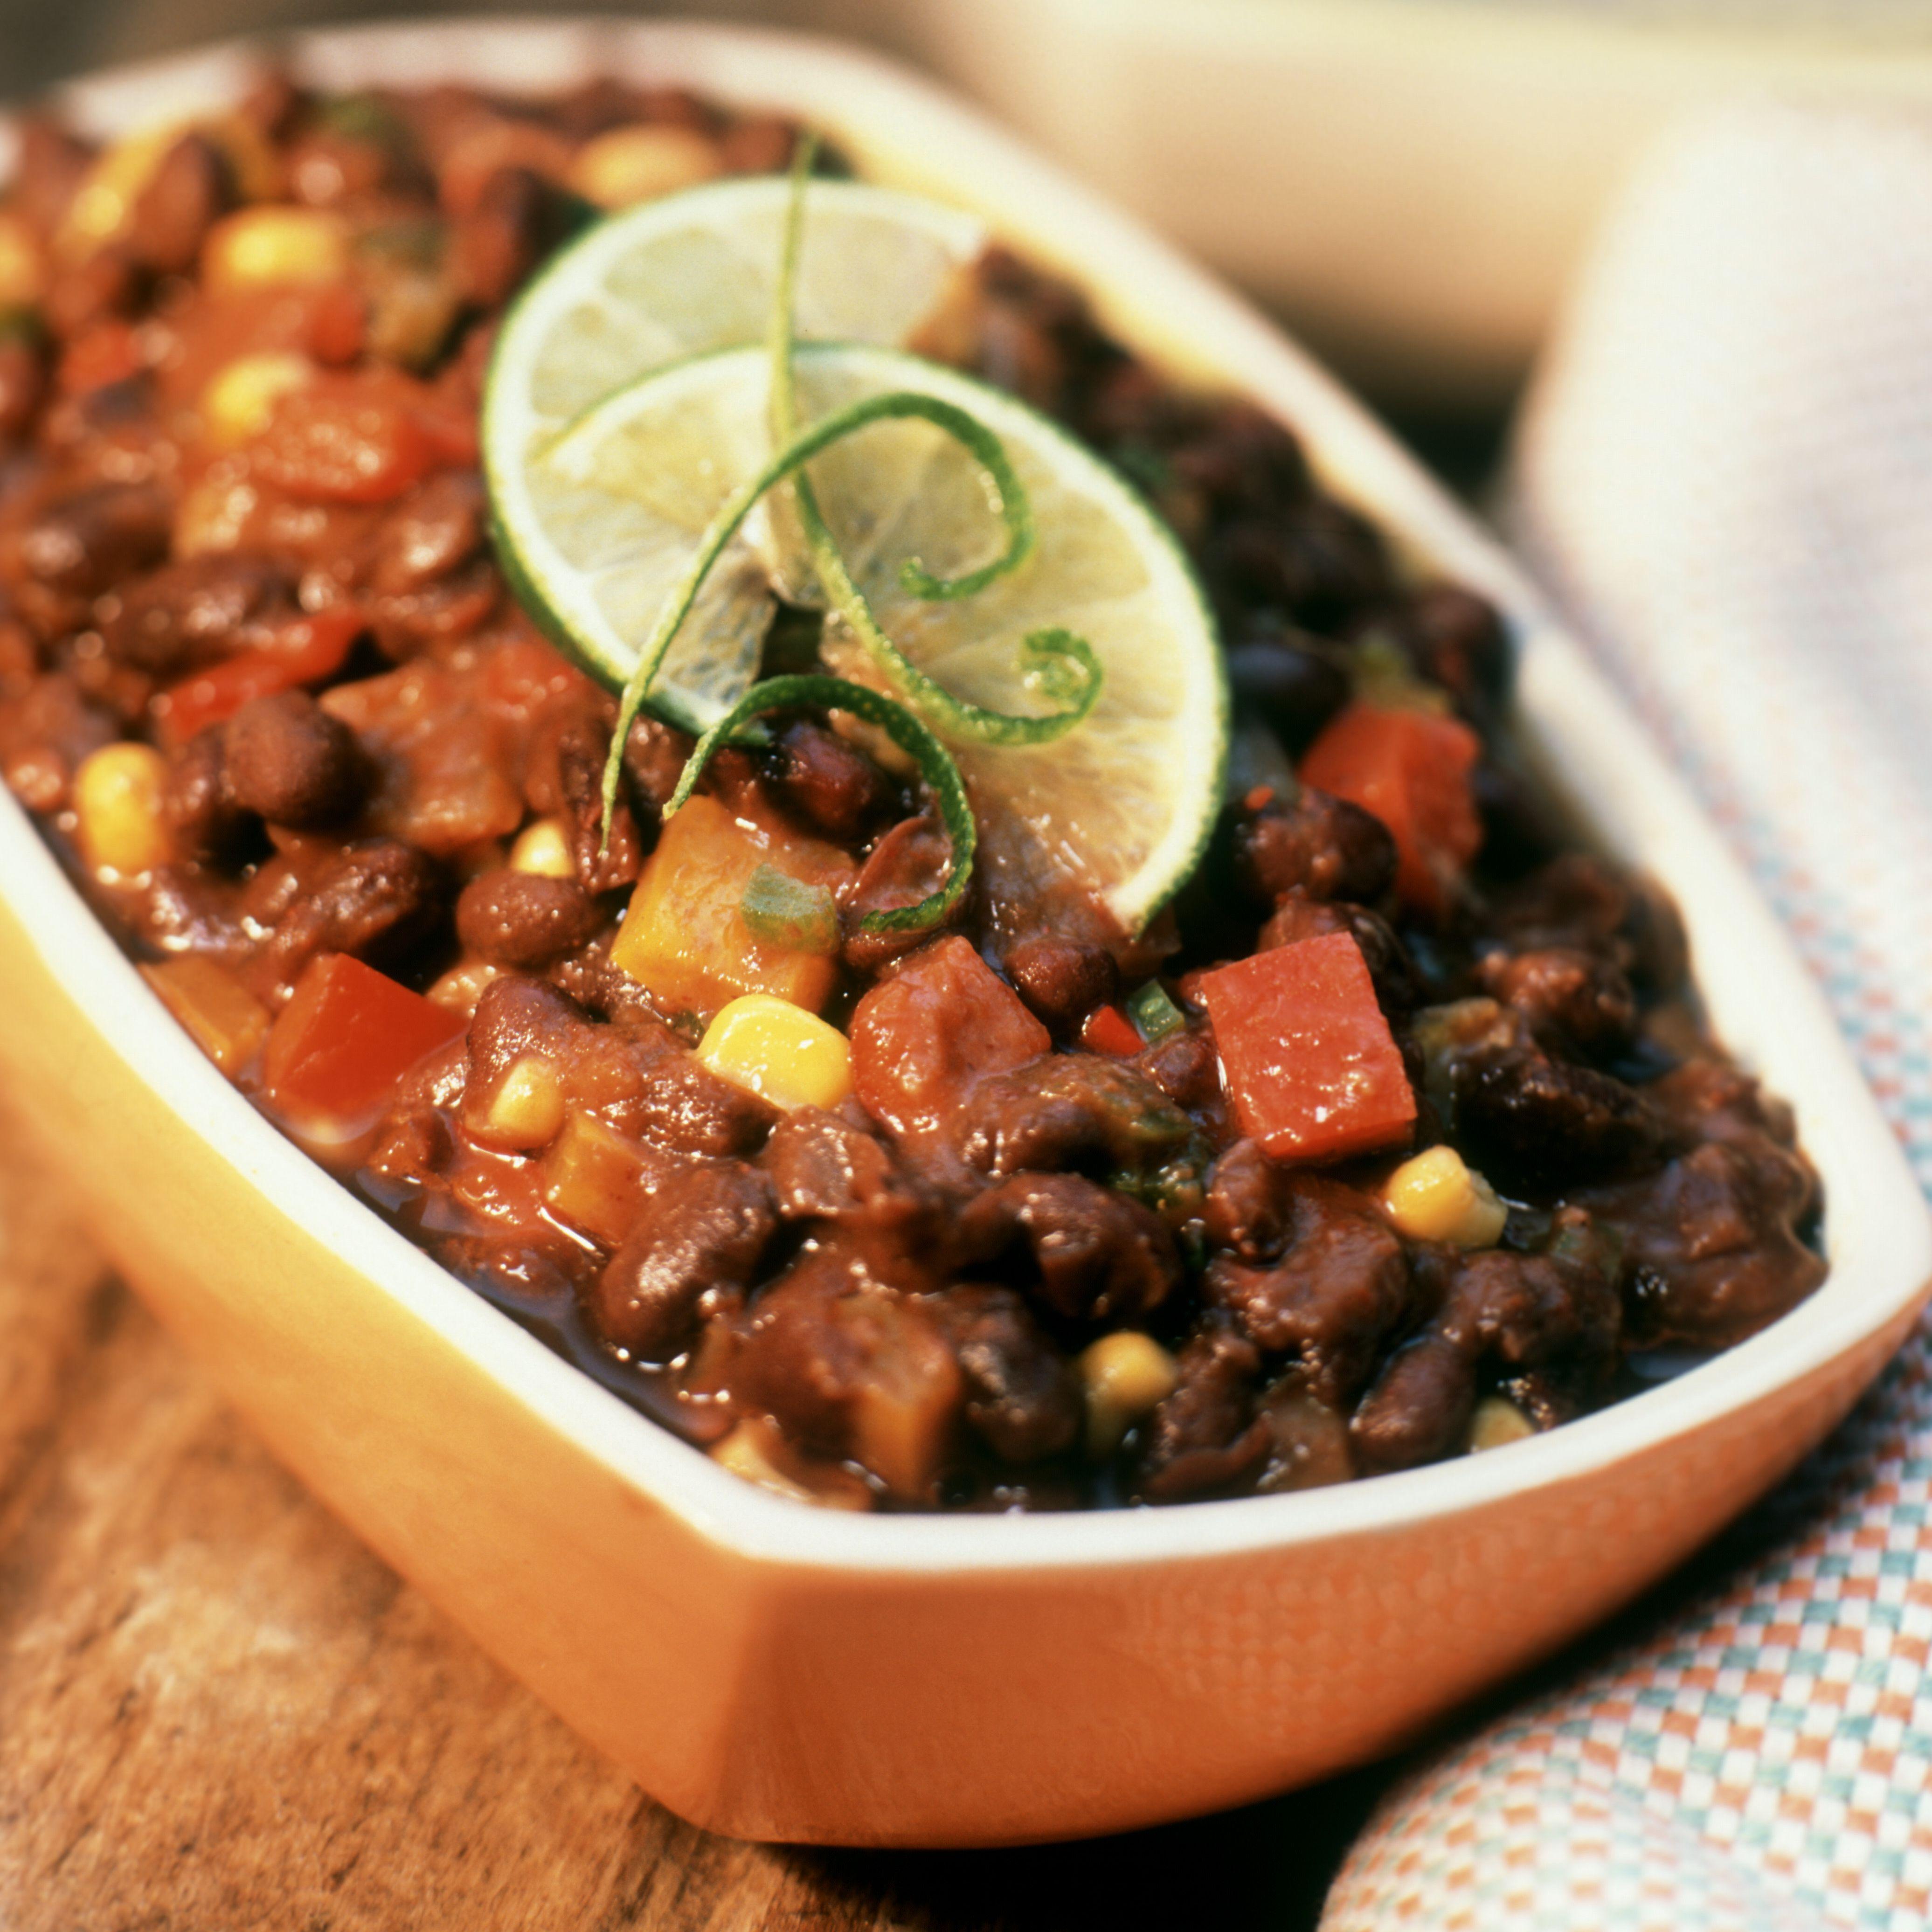 Dish of black bean chili